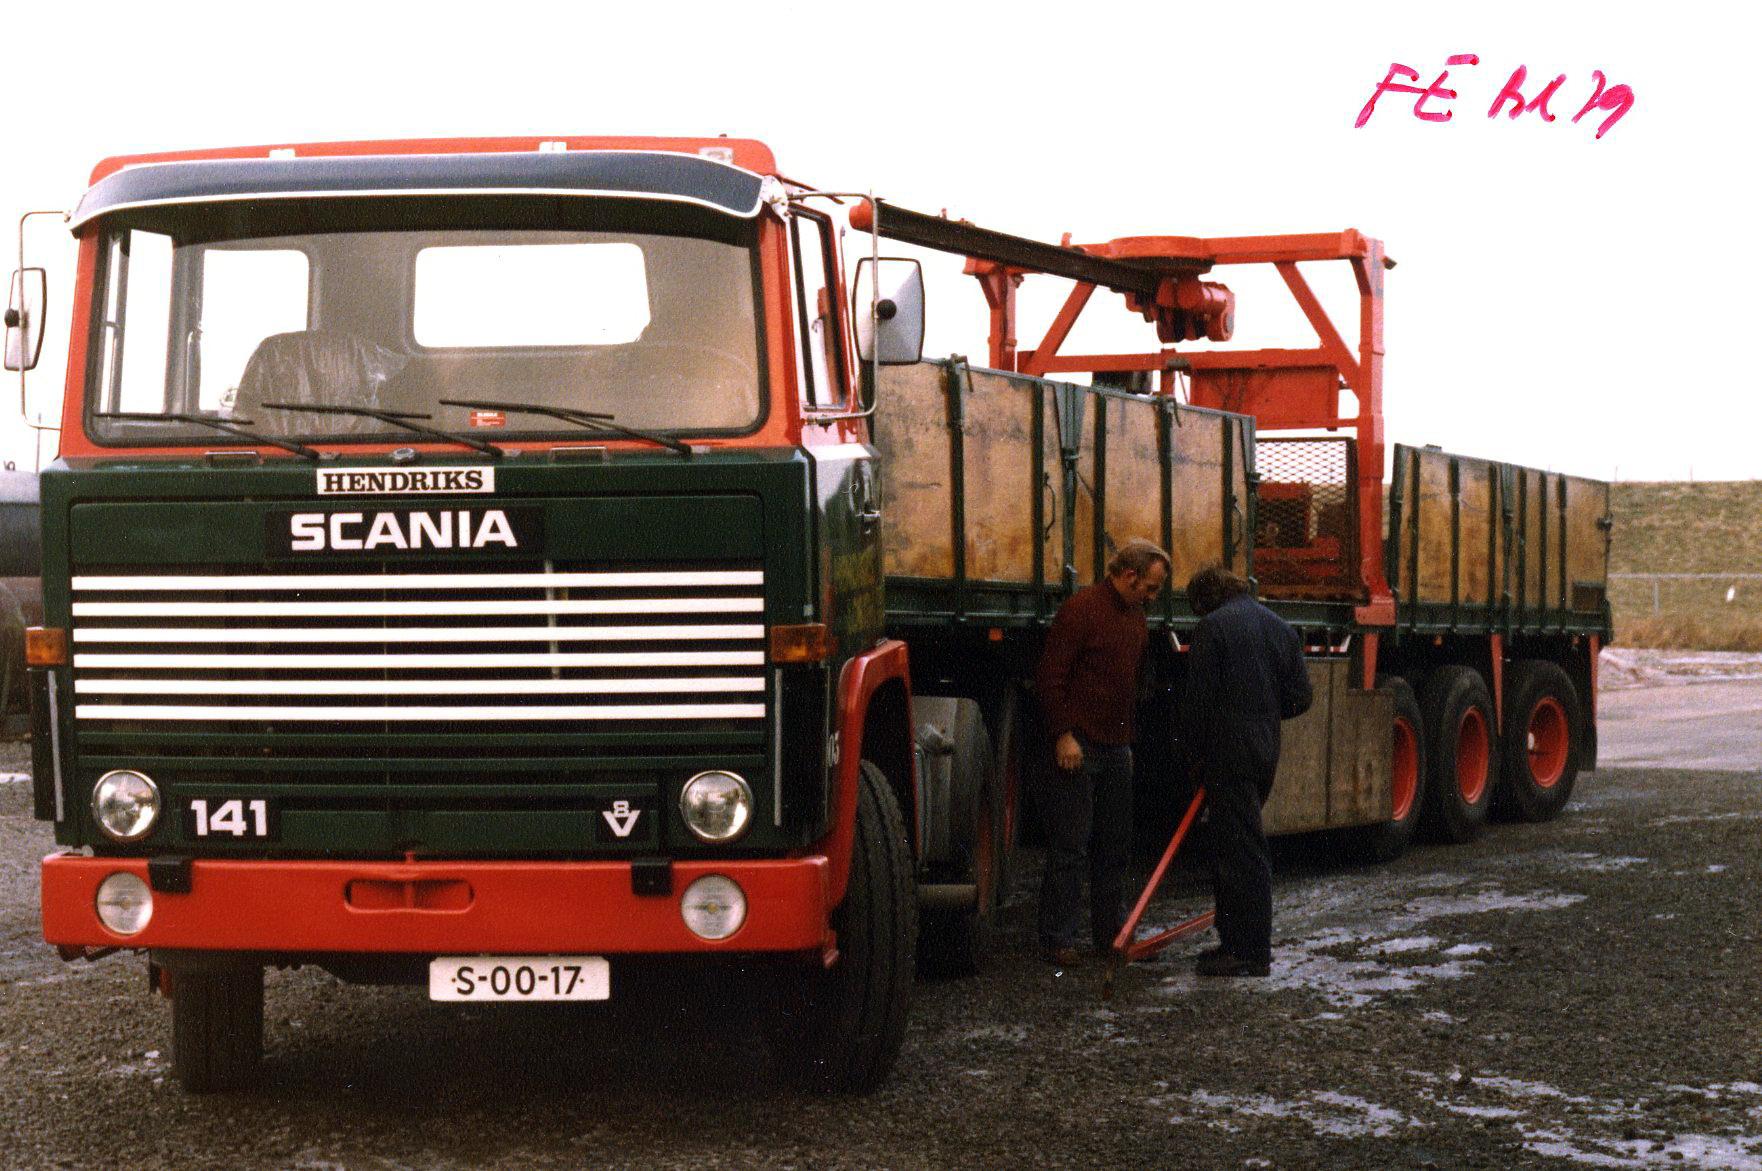 Hendriks-Lobith-Scania-LB141-S0017-2